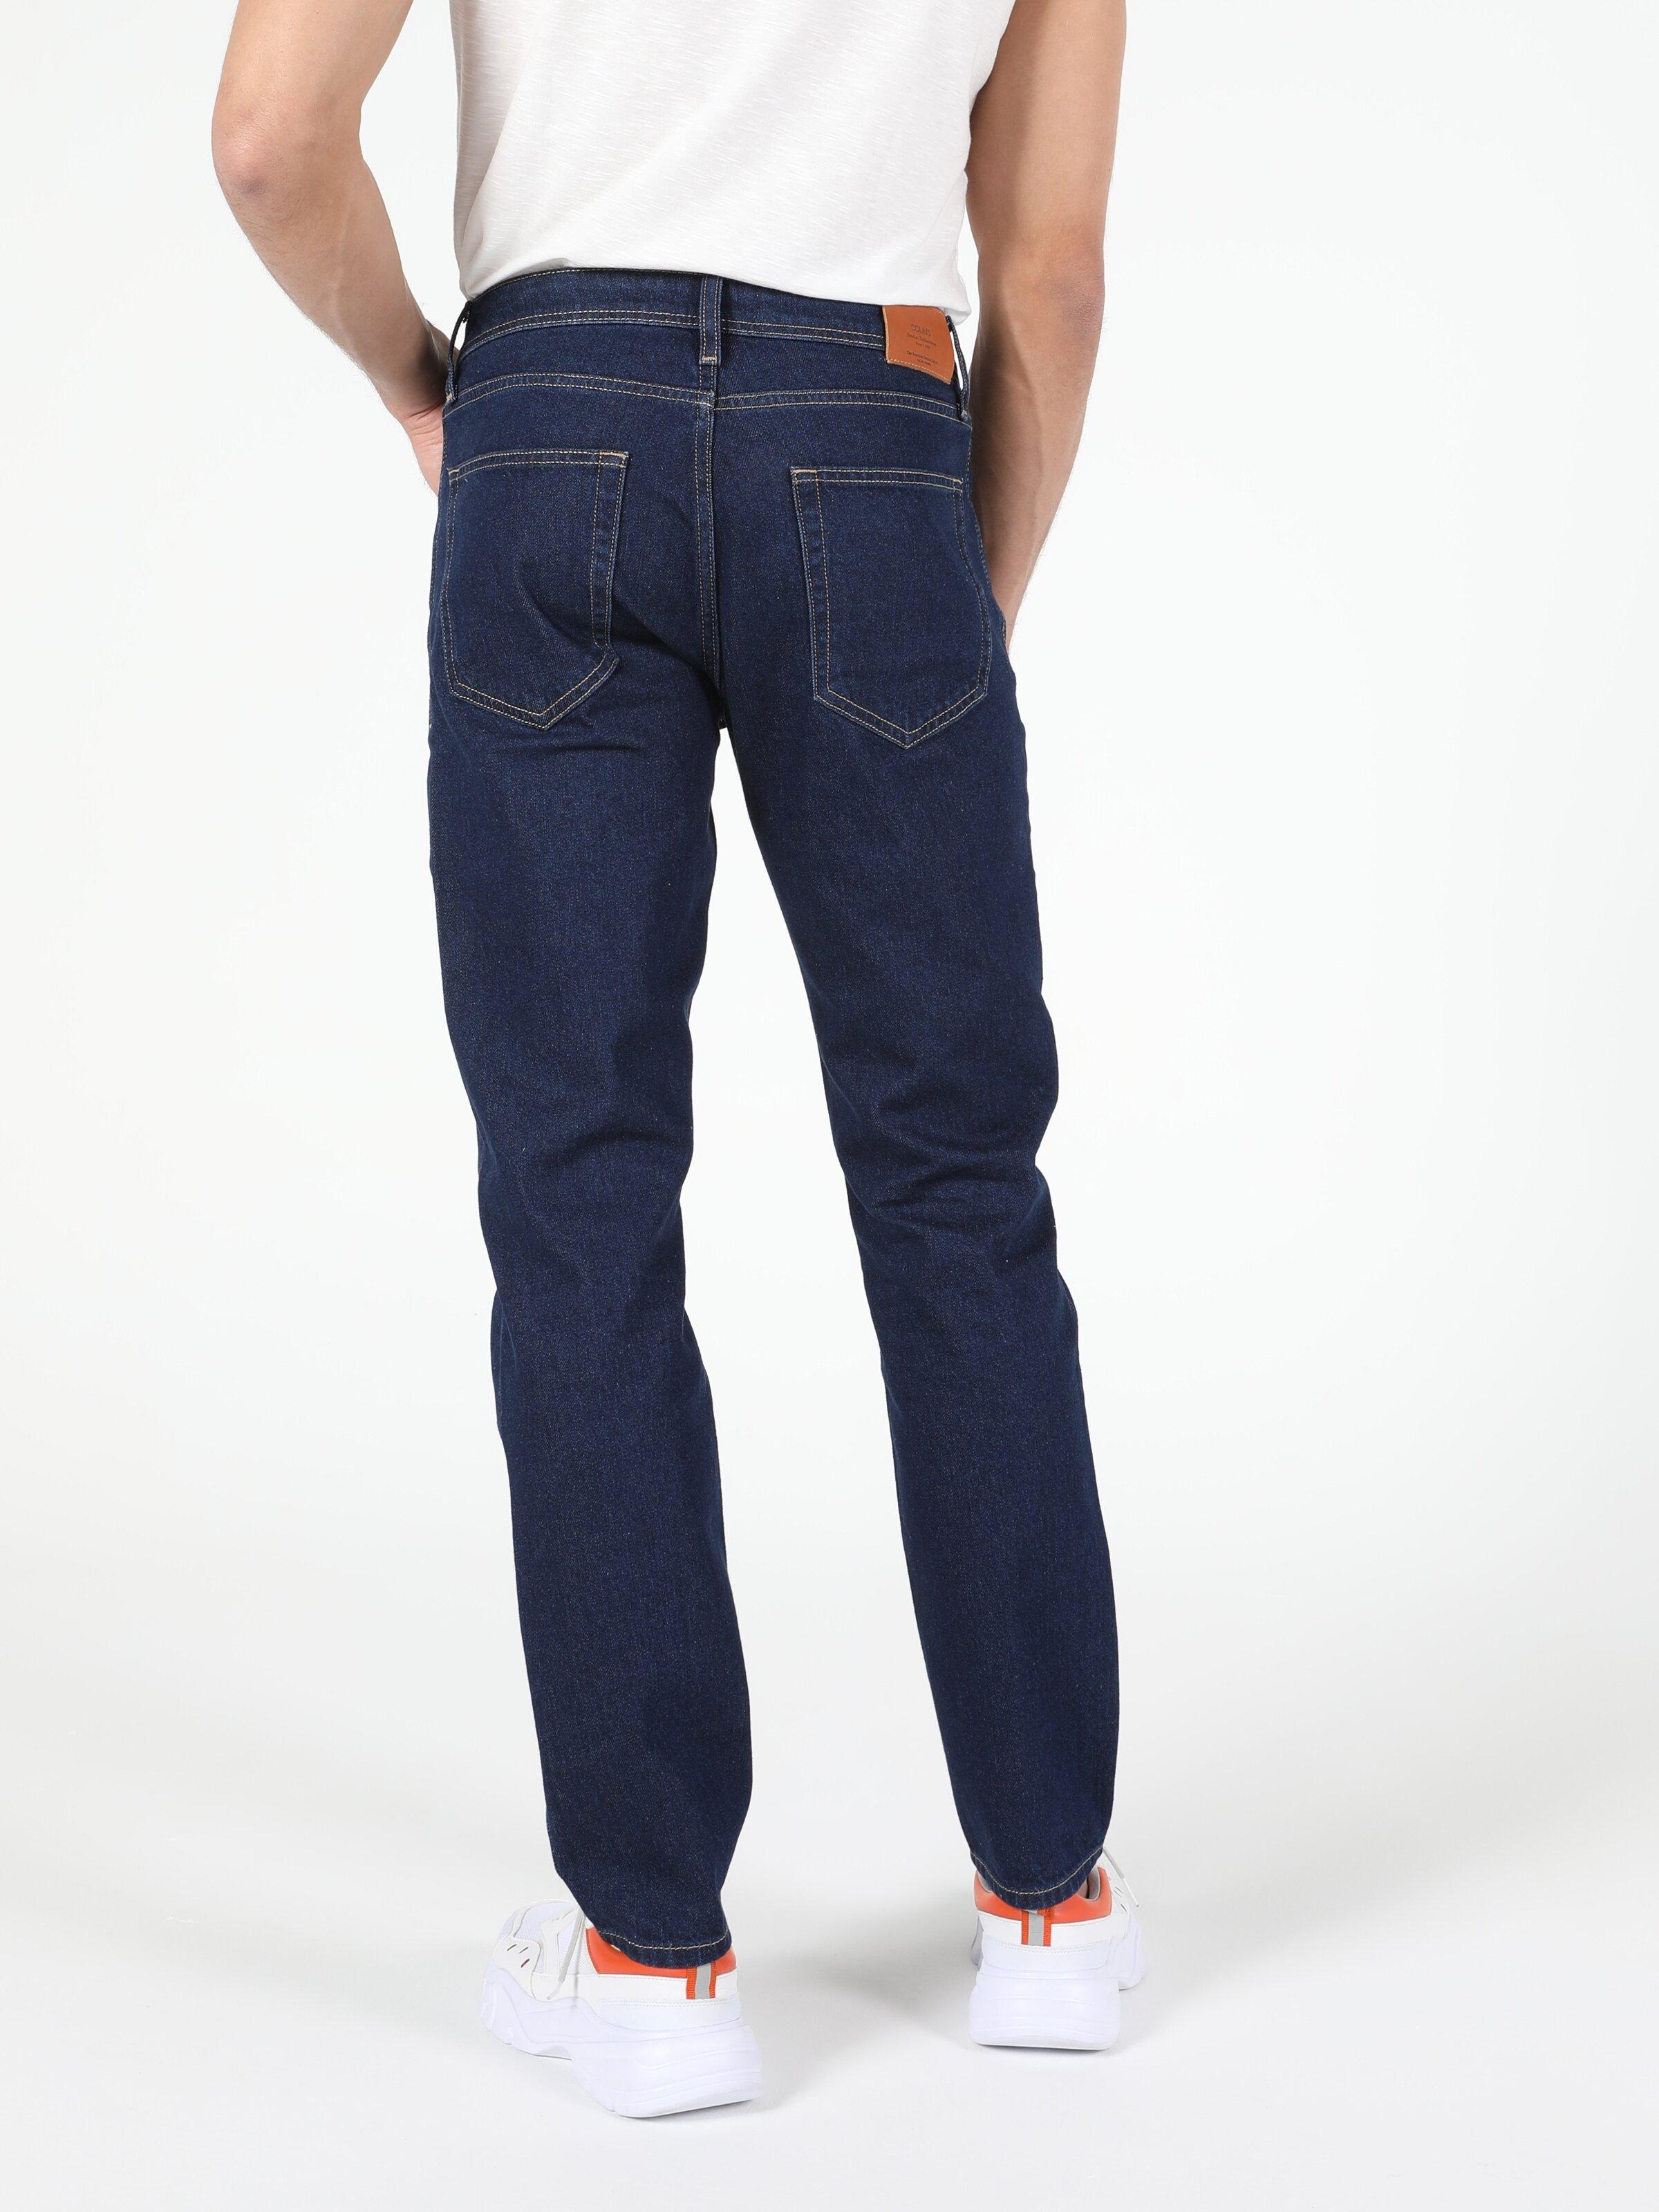 044 Karl Düşük Bel Düz Paça Straight Fit Jean Erkek Jean Pantolon